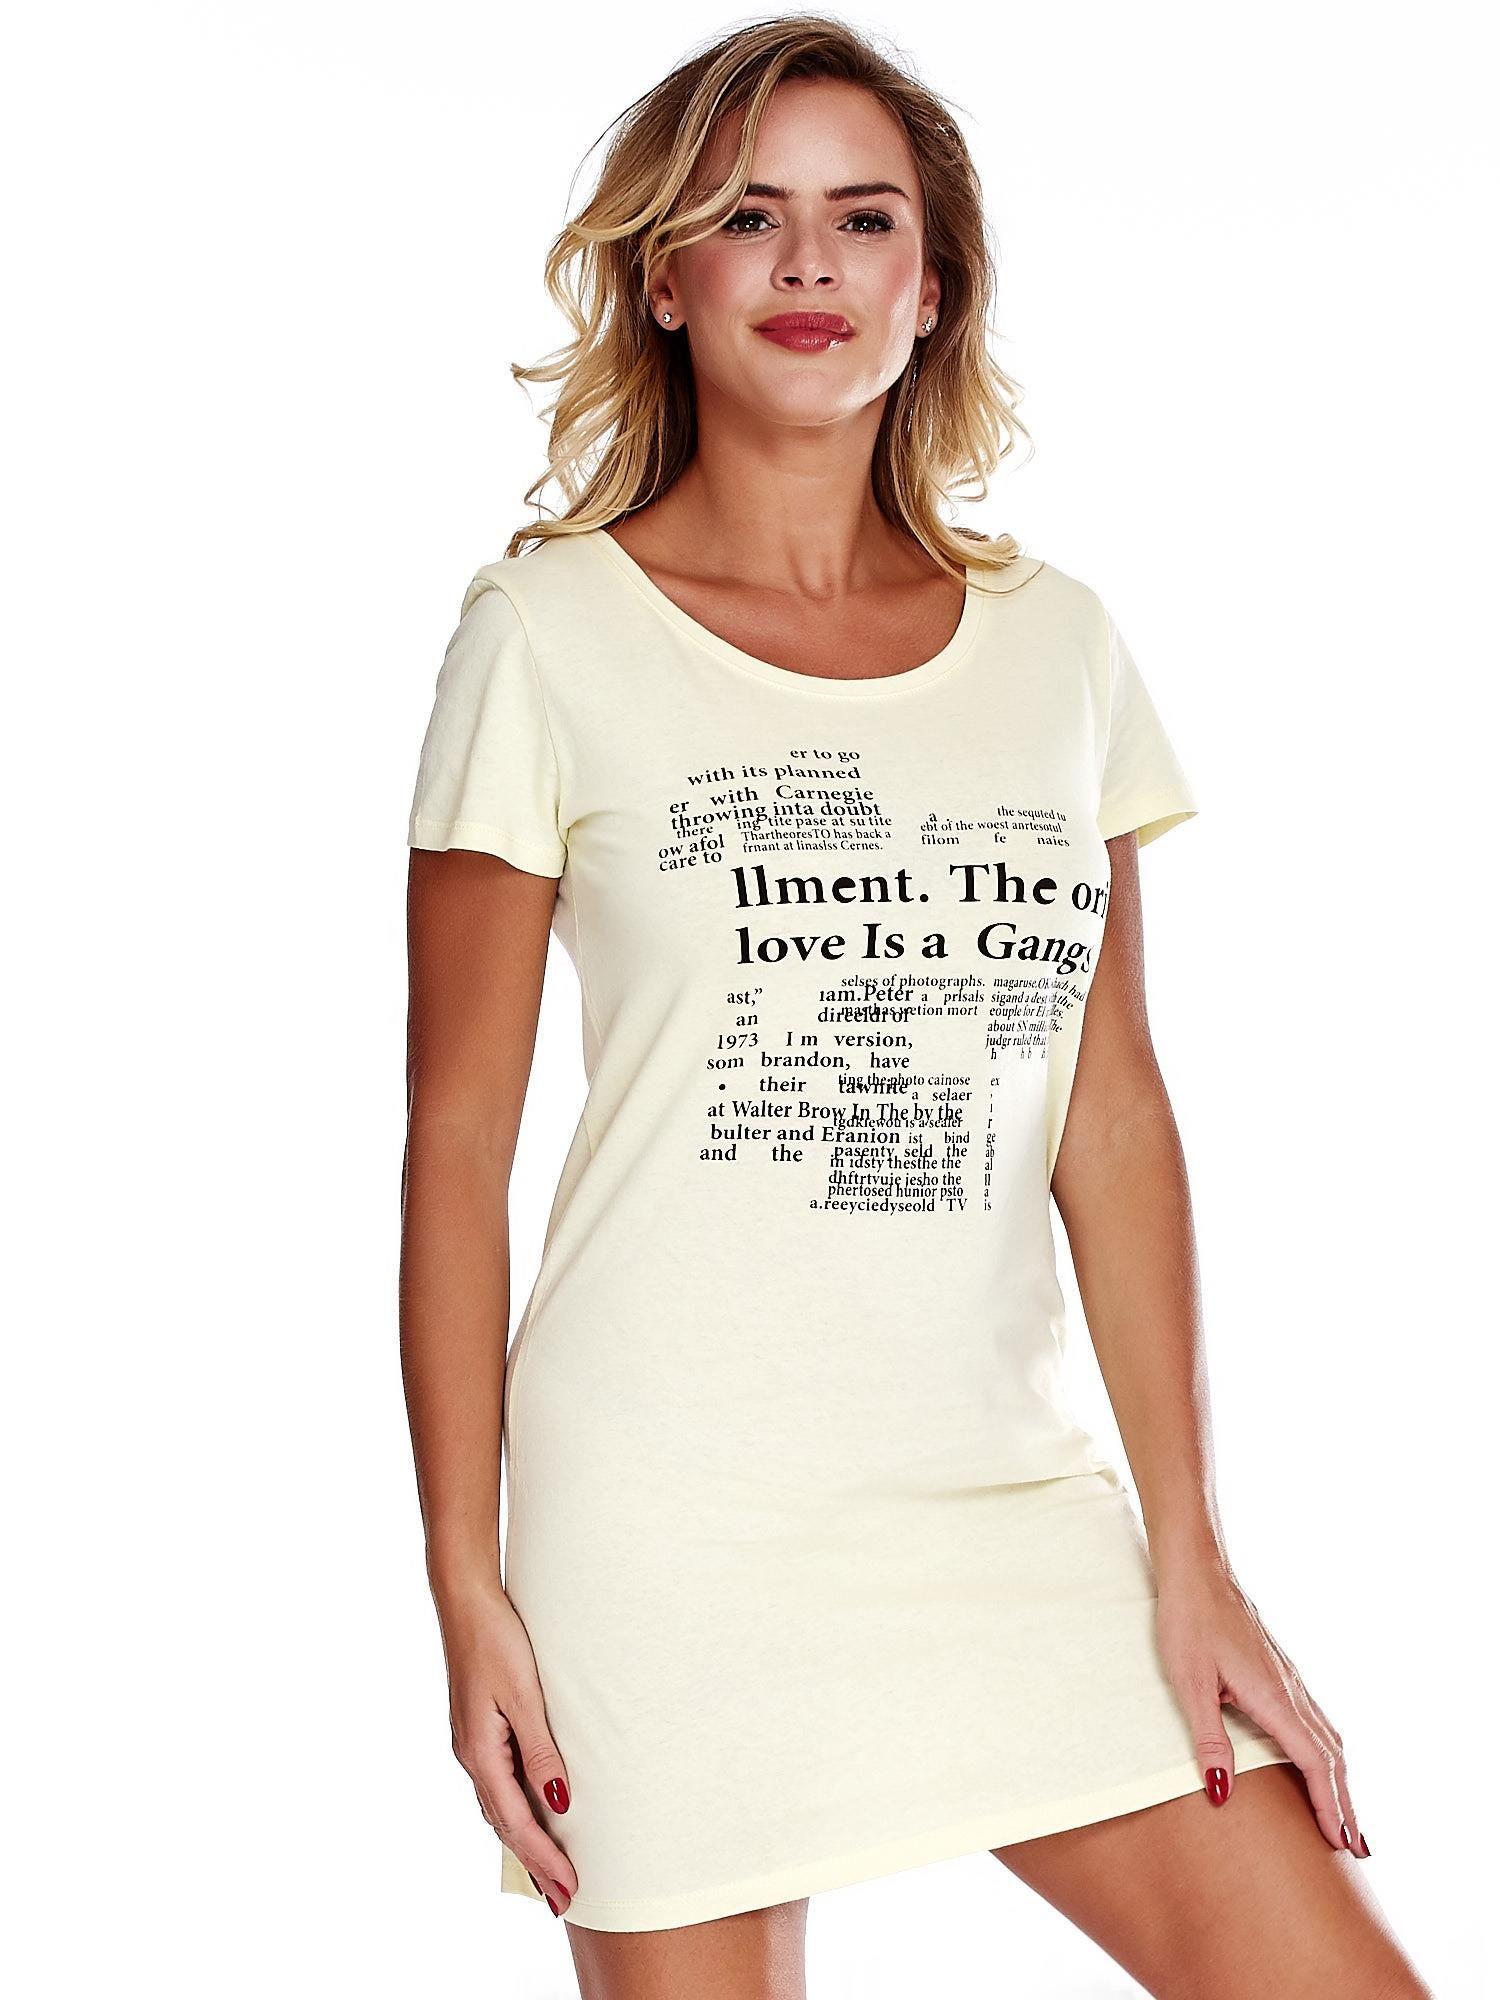 3665dafe3b Żółta koszula nocna z nadrukiem newspaper - Bielizna piżama - sklep ...